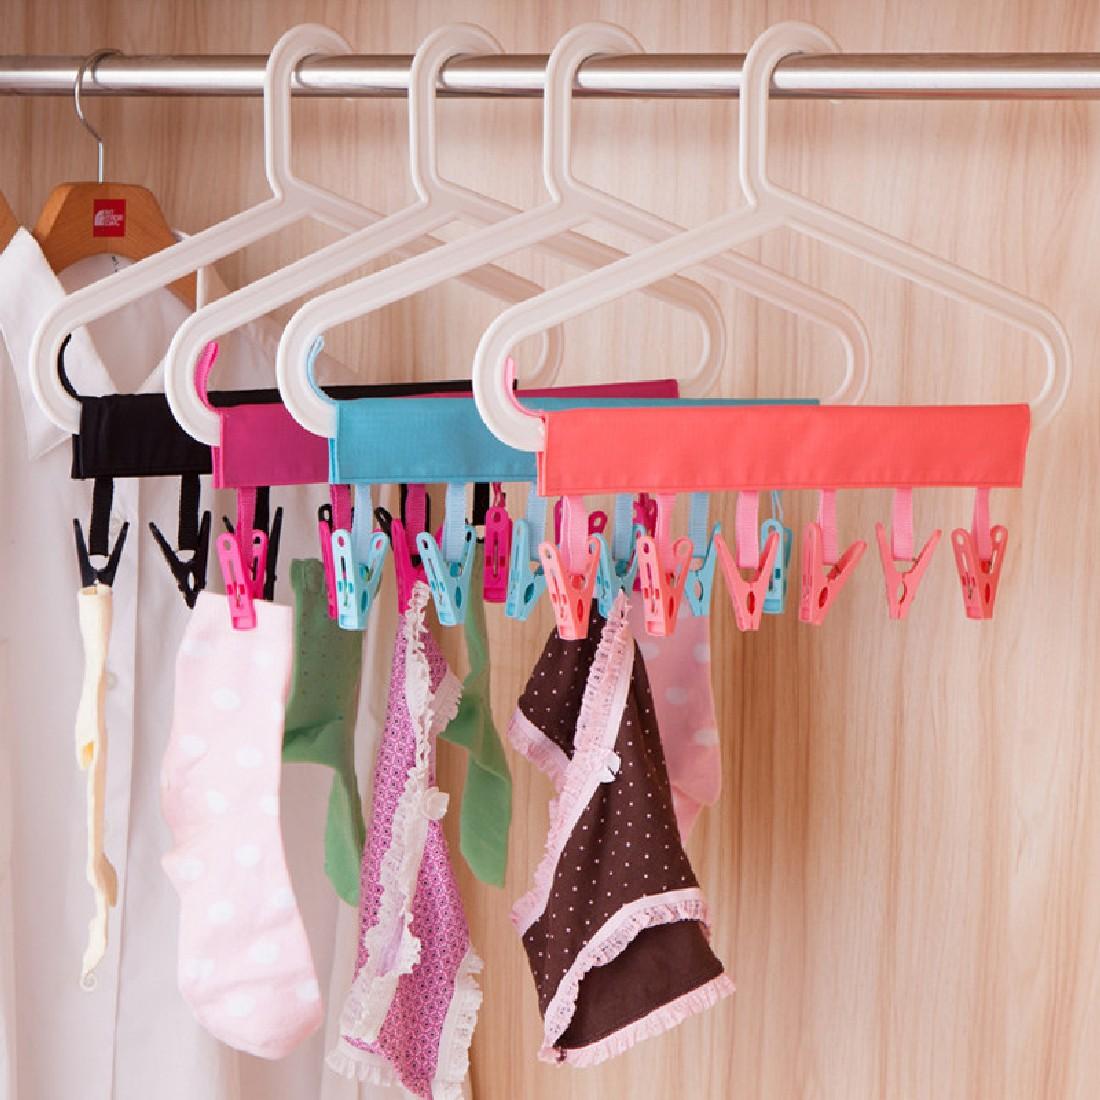 New Dacron Plastic Portable Bathrooms Cloth Hanger Rack Clothespin Business Travel Portable Folding Cloth Hanger Clips